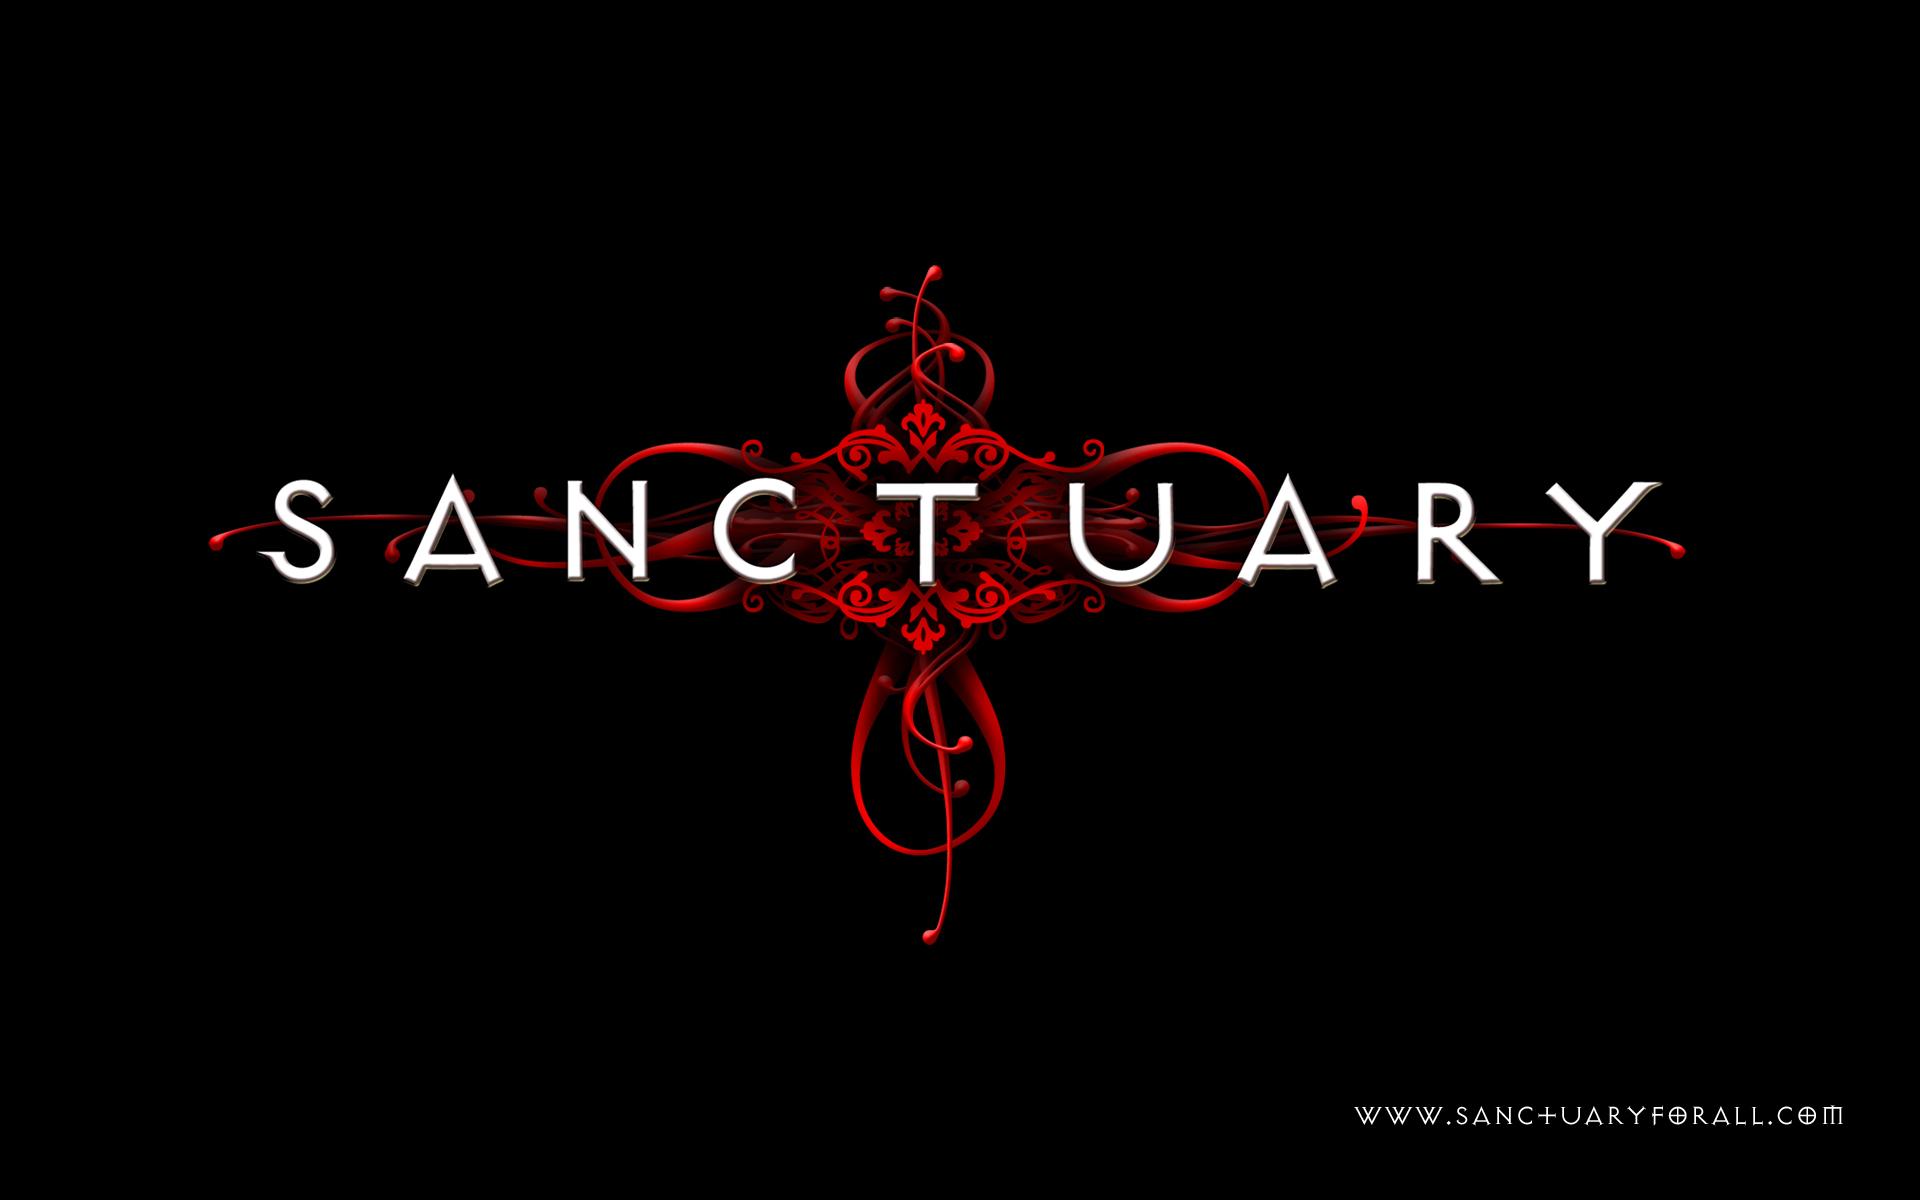 God Quotes Hd Wallpaper Sanctuary Sanctuary Wallpaper 9138640 Fanpop